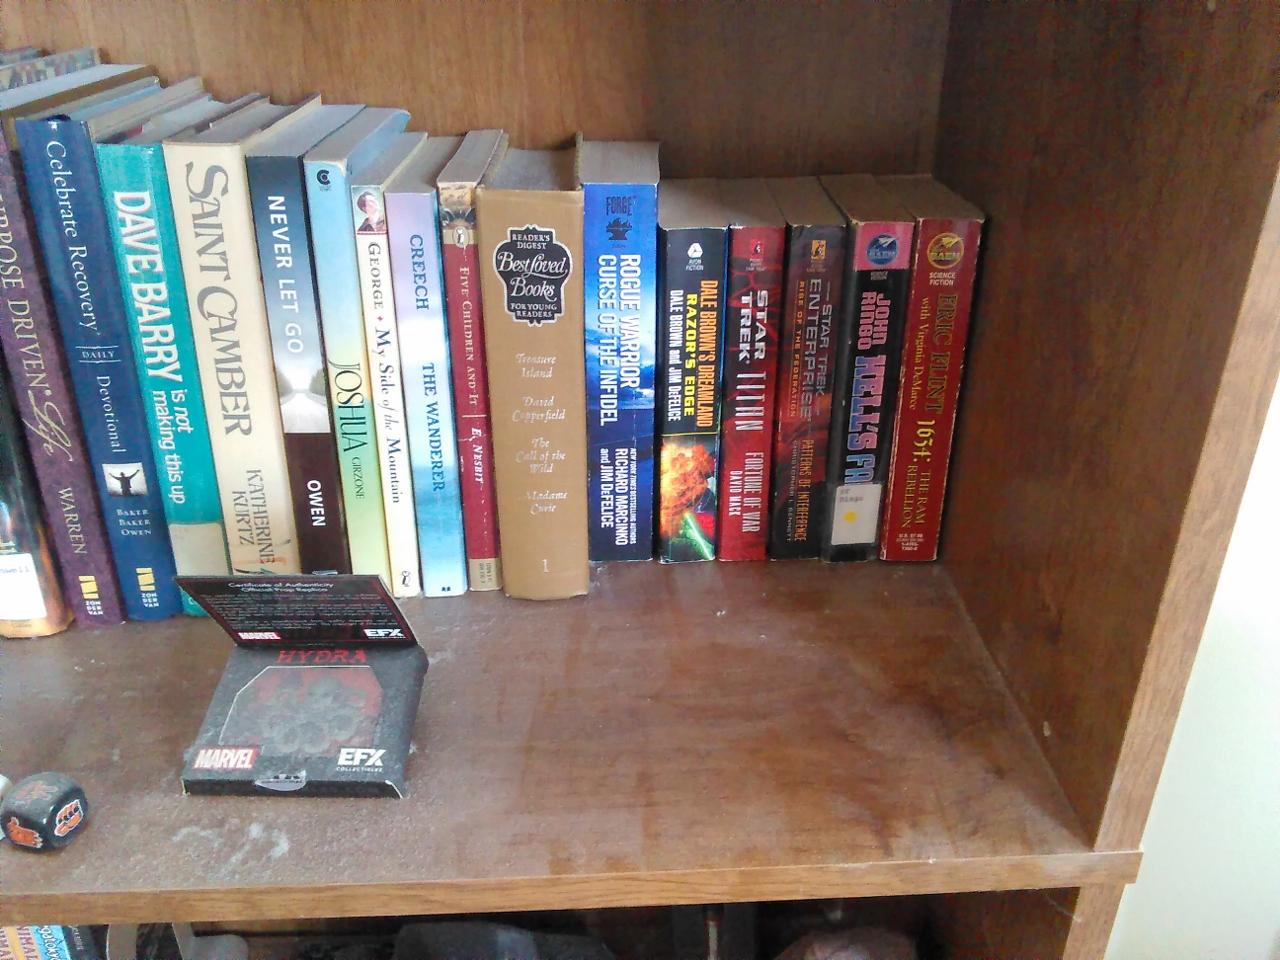 Bookshelf 5-23-2018 8-47-26 AM